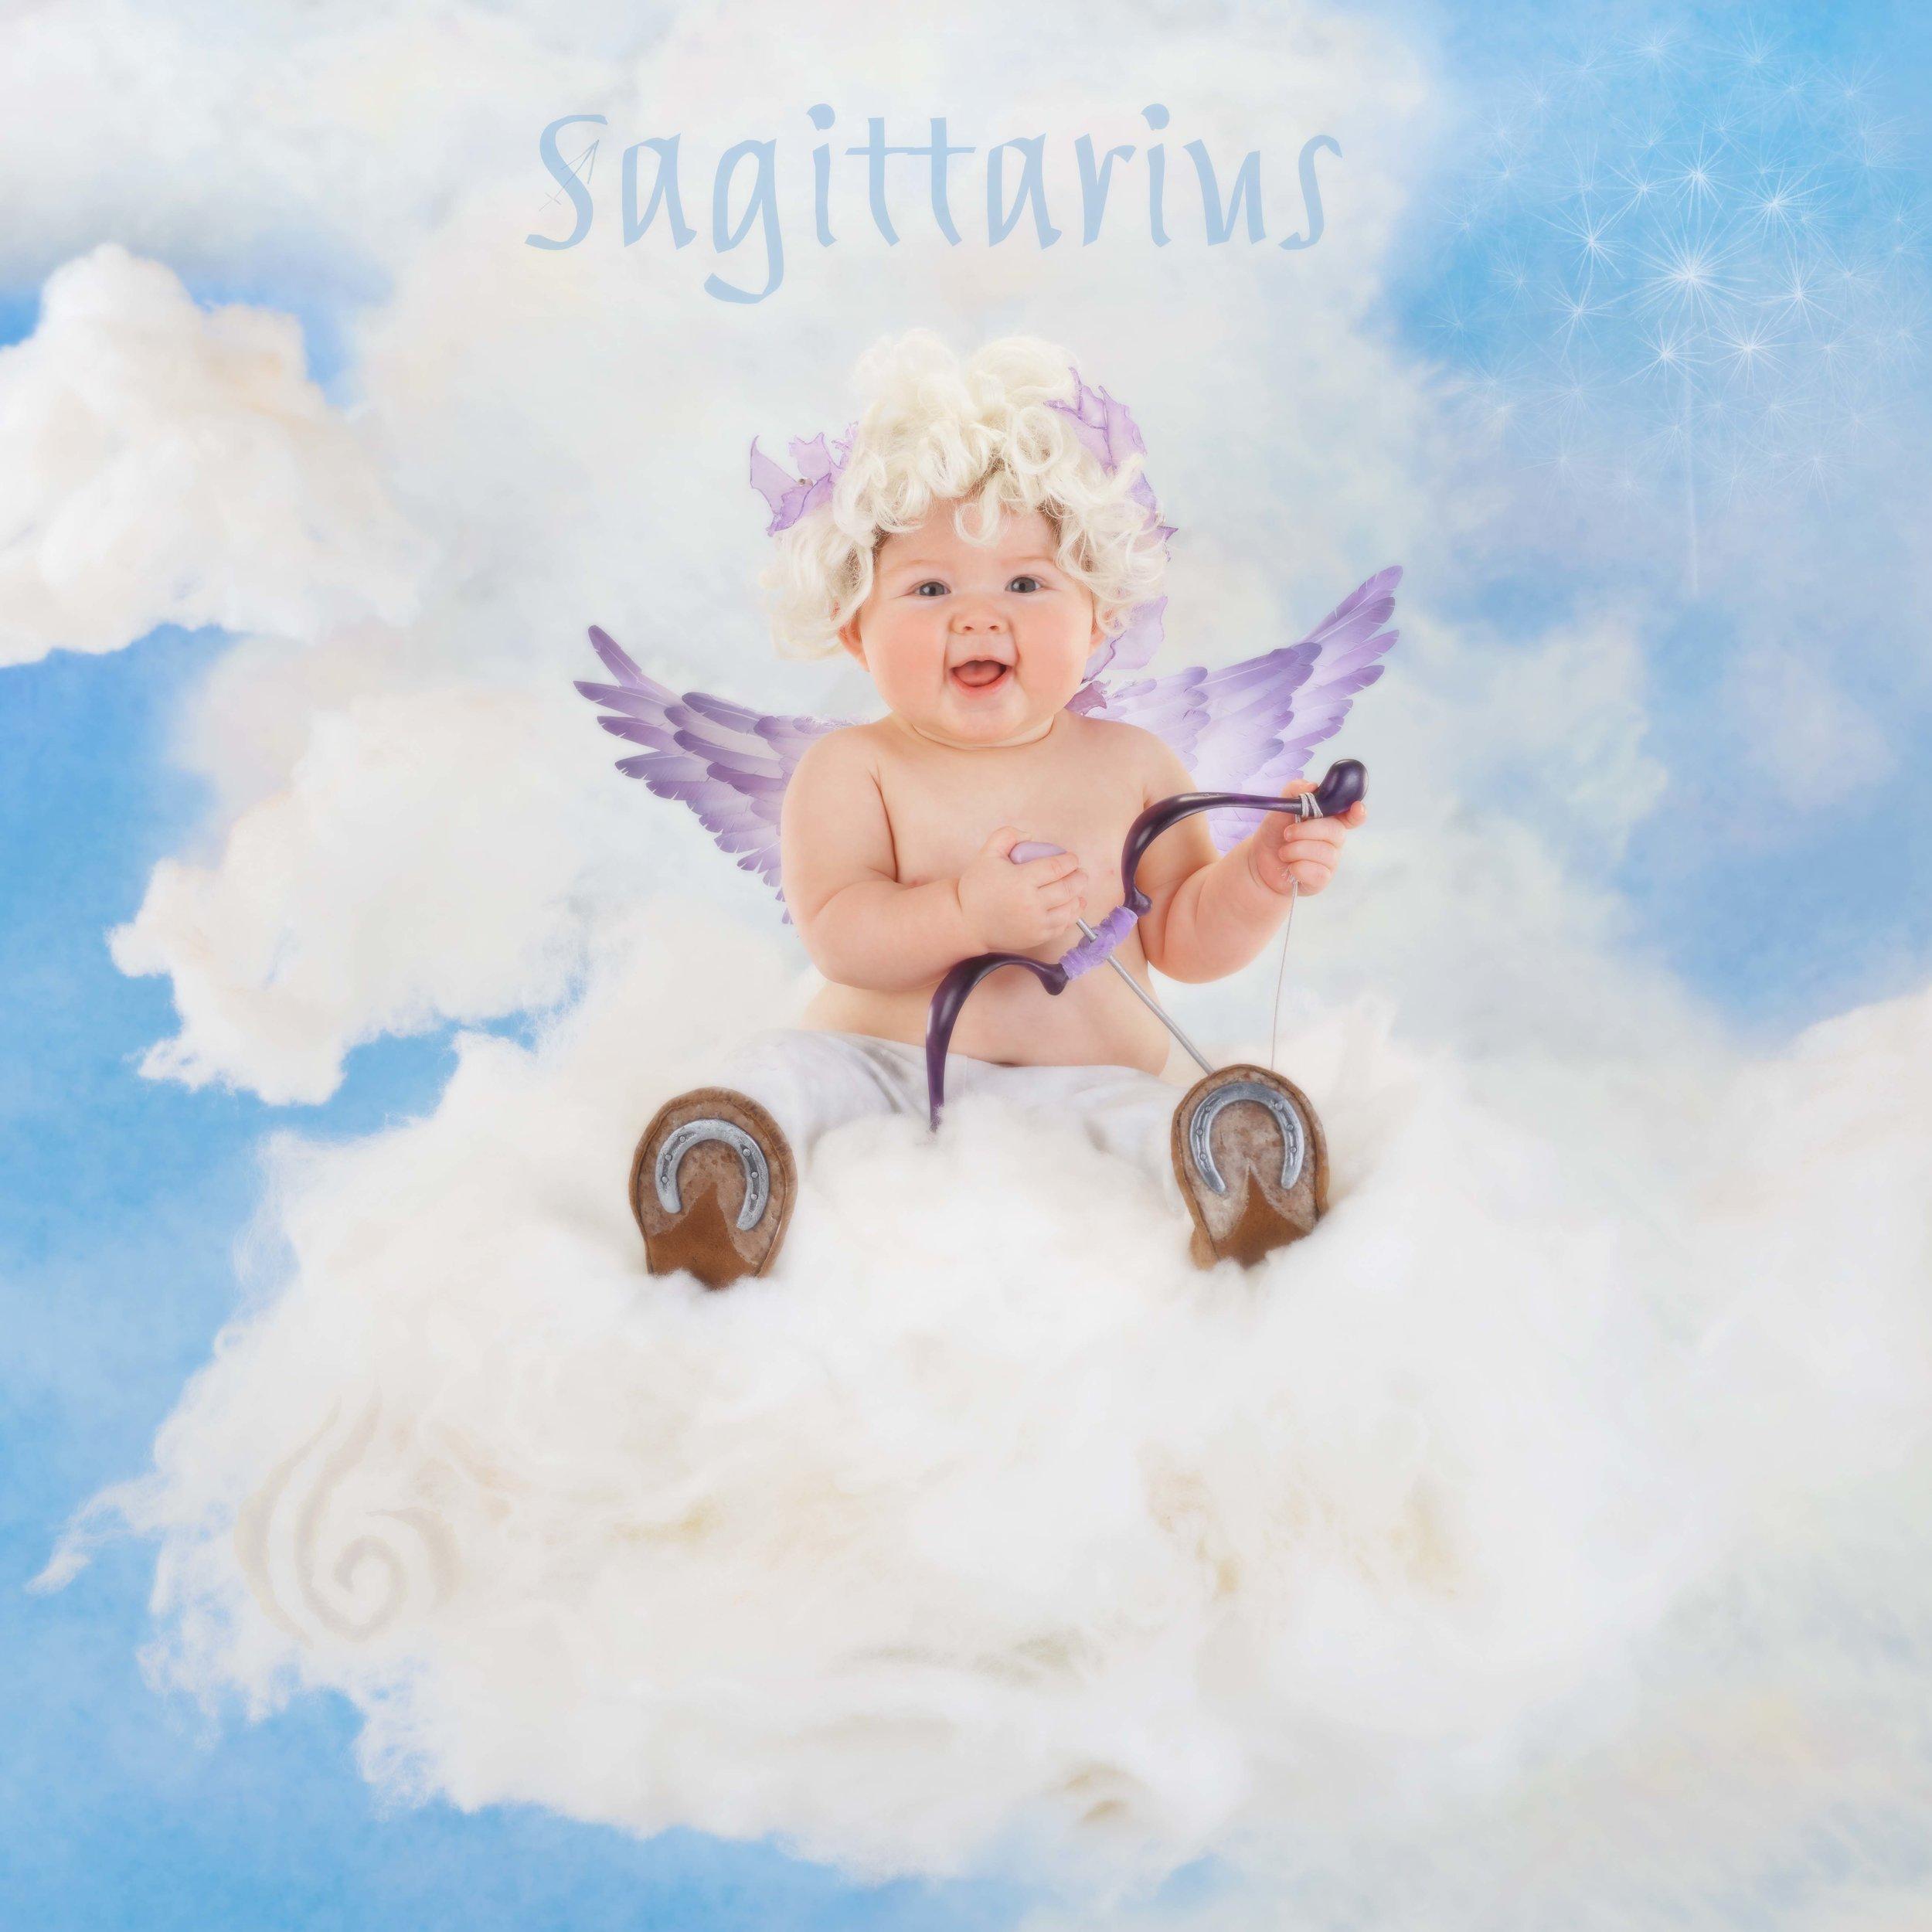 Sagittarius.jpg